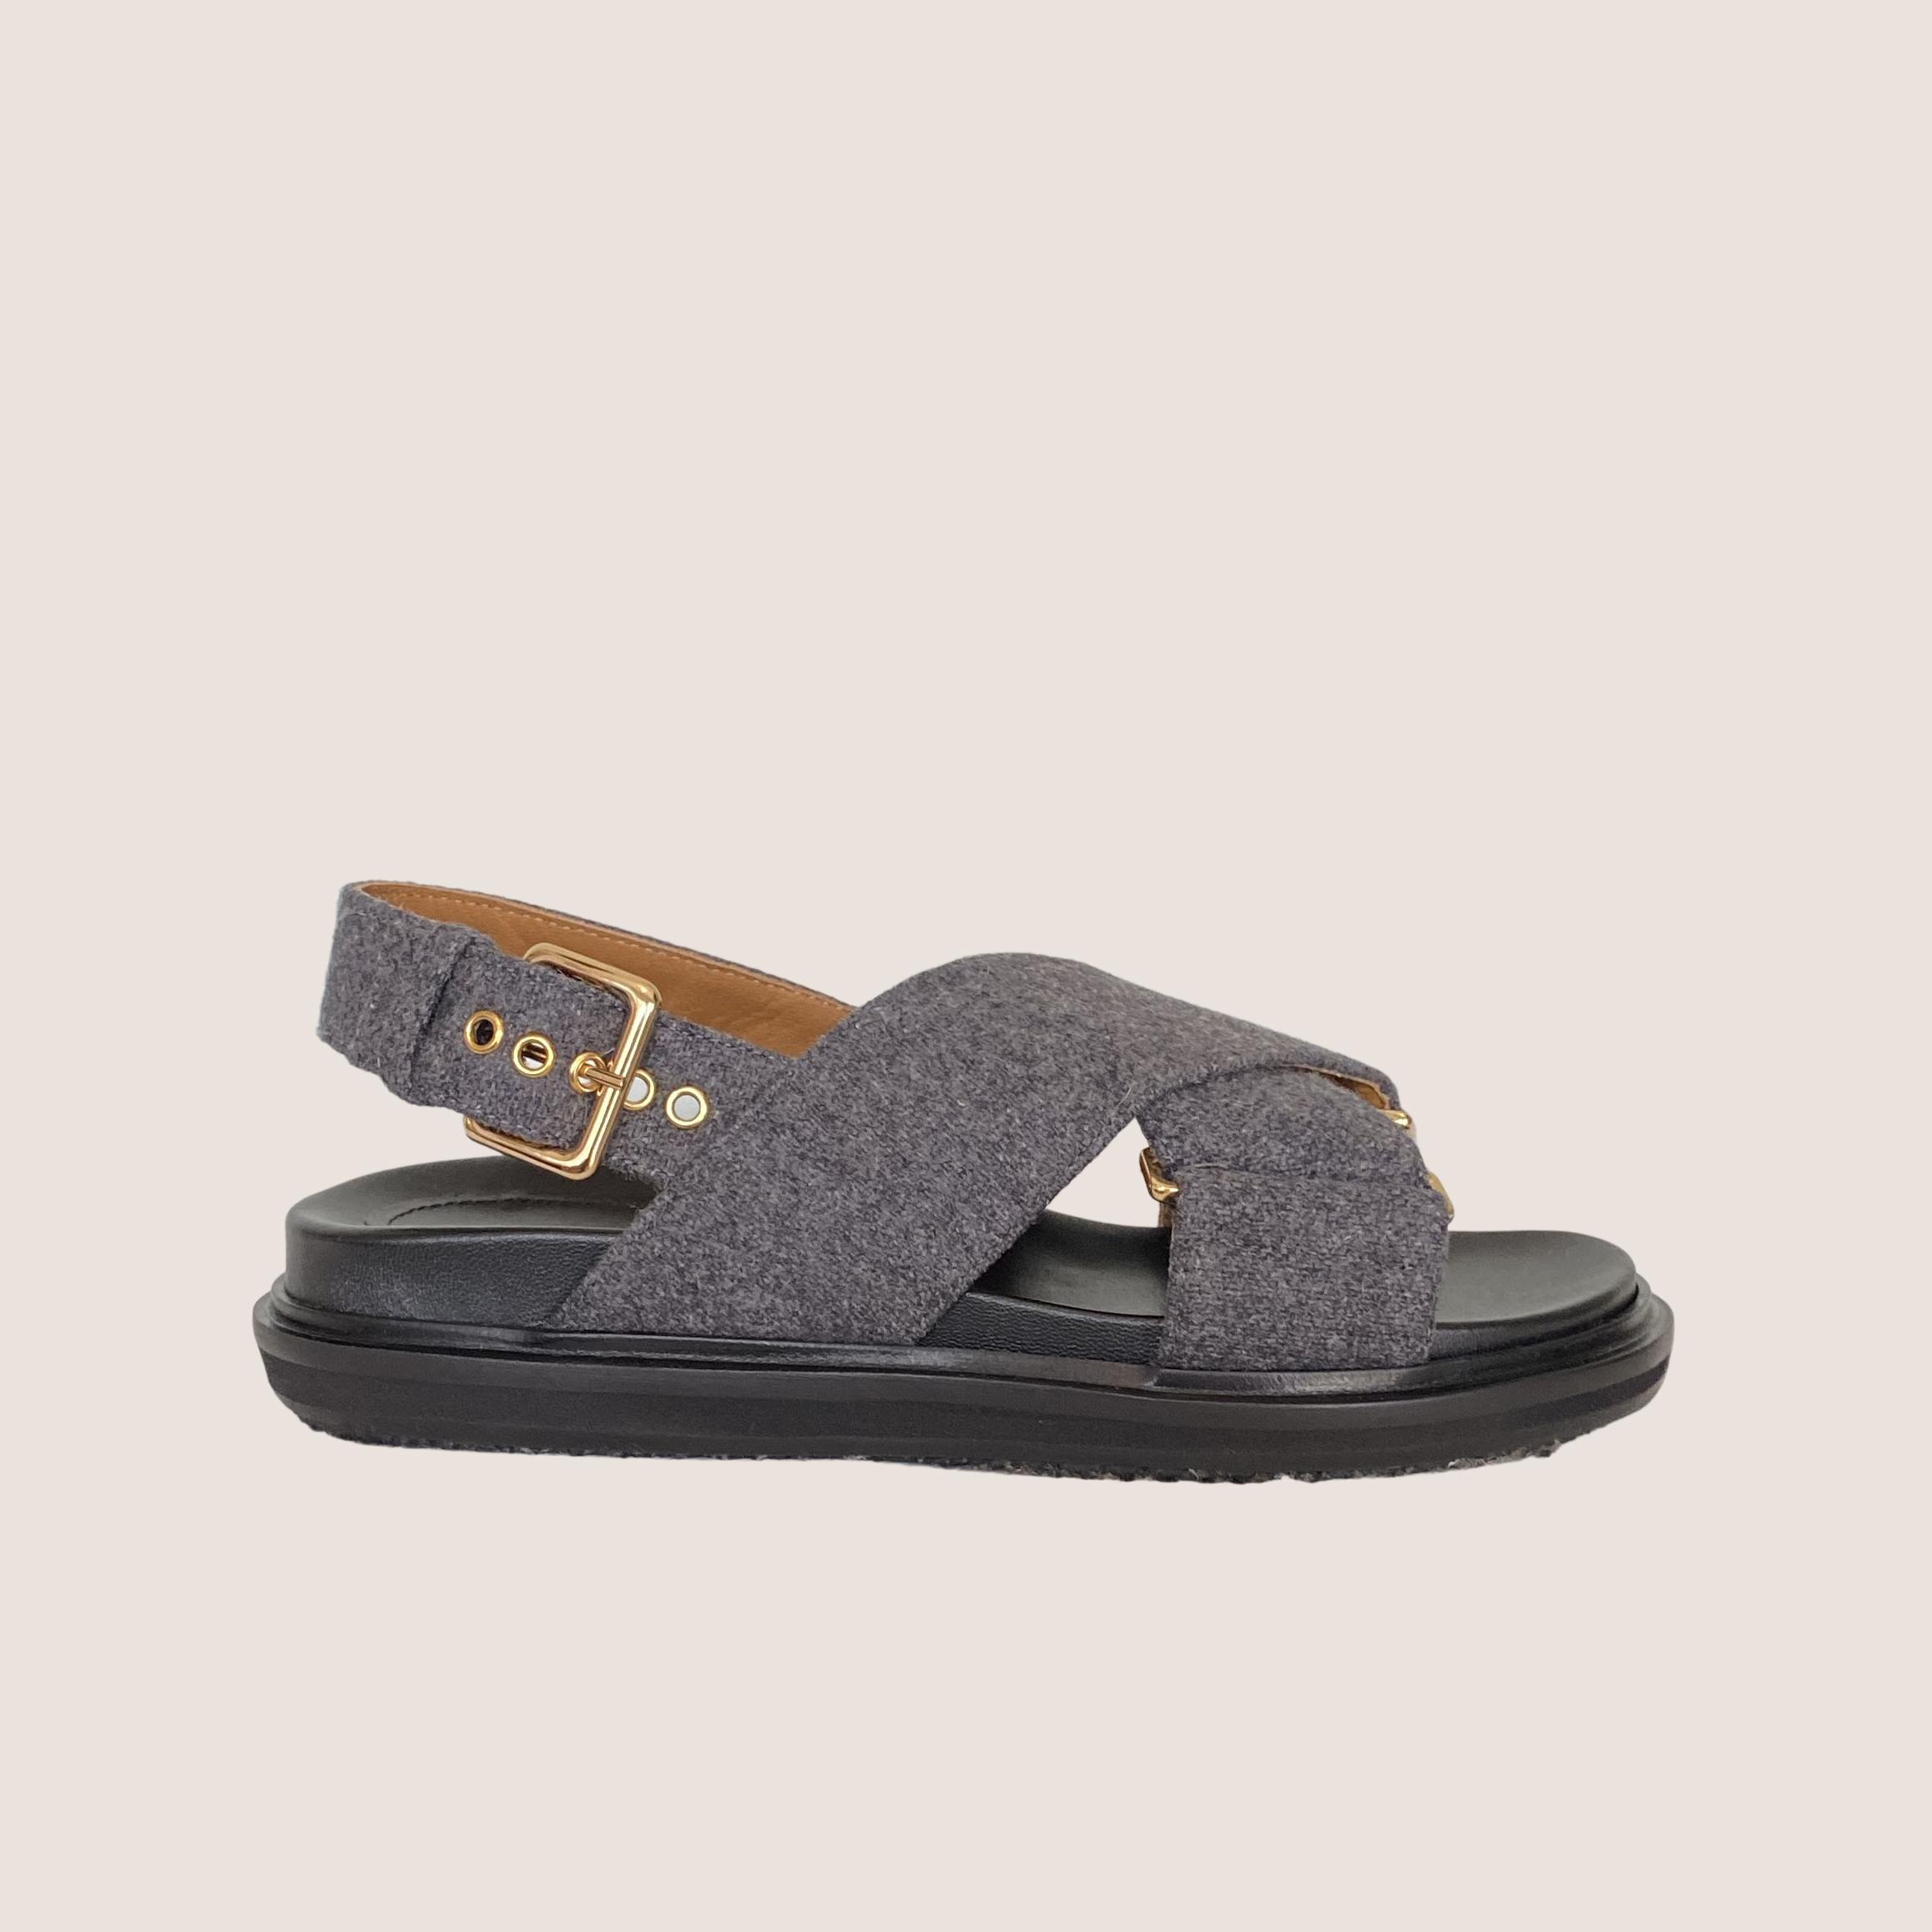 Fussbet Sandal